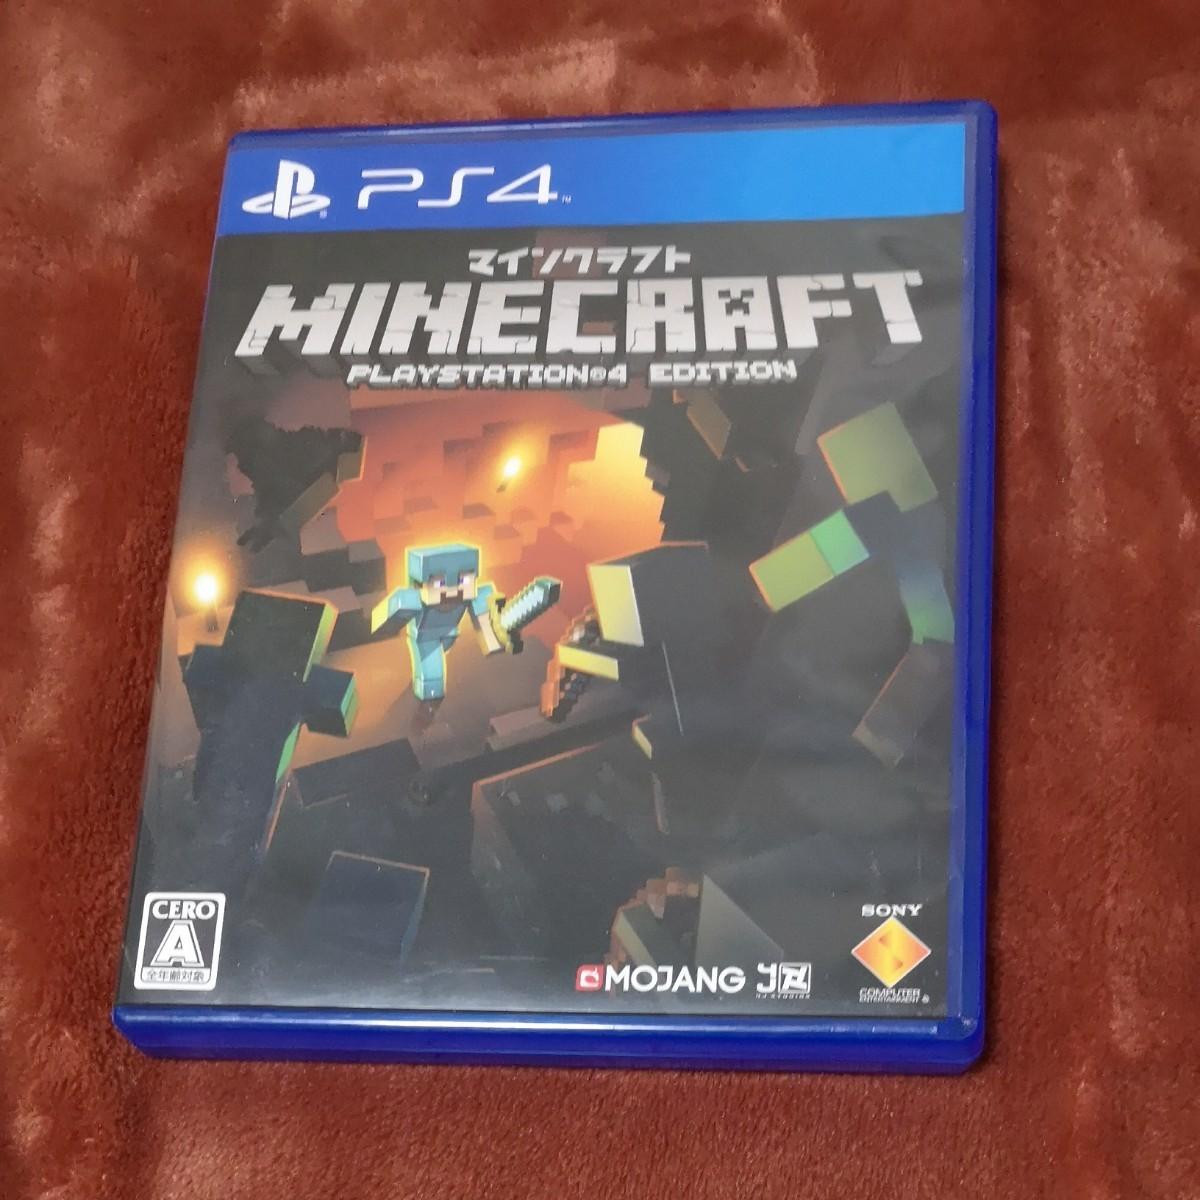 【PS4】 マインクラフト(Minecraft) PS4マインクラフト PlayStation4 EDITION